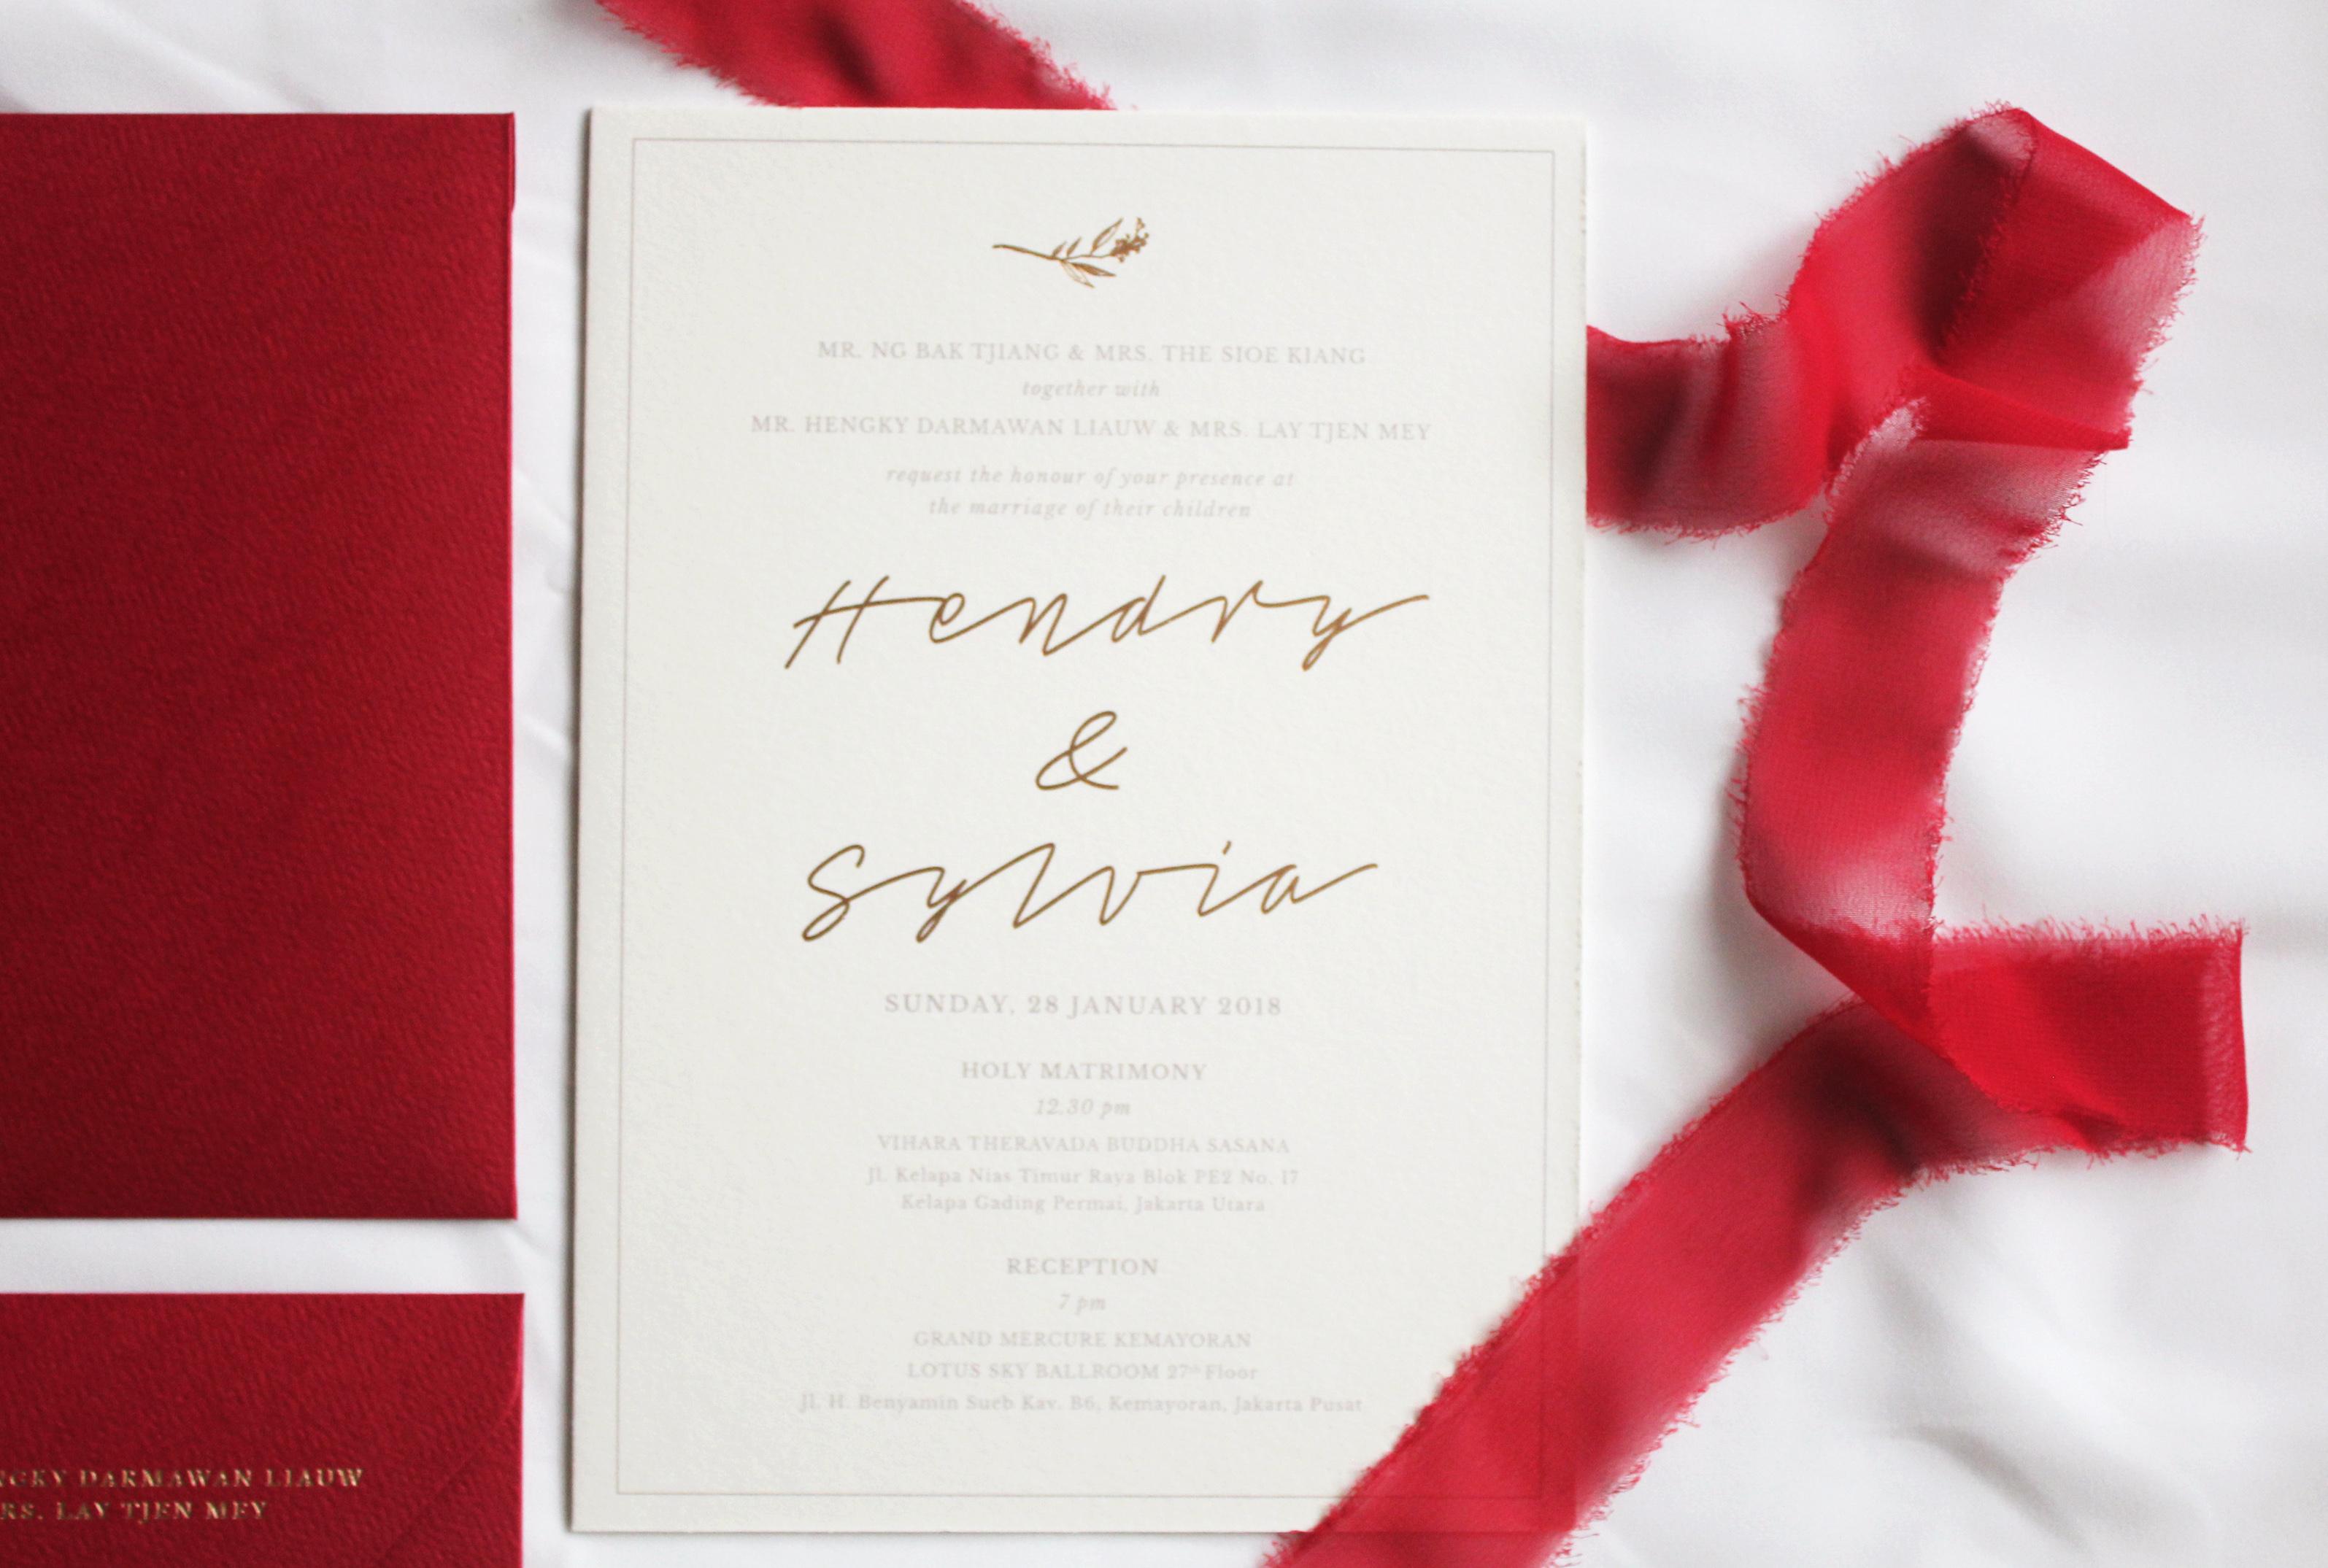 The Wedding of Hendry & Sylvia by Mo & Nemone | Bridestory.com